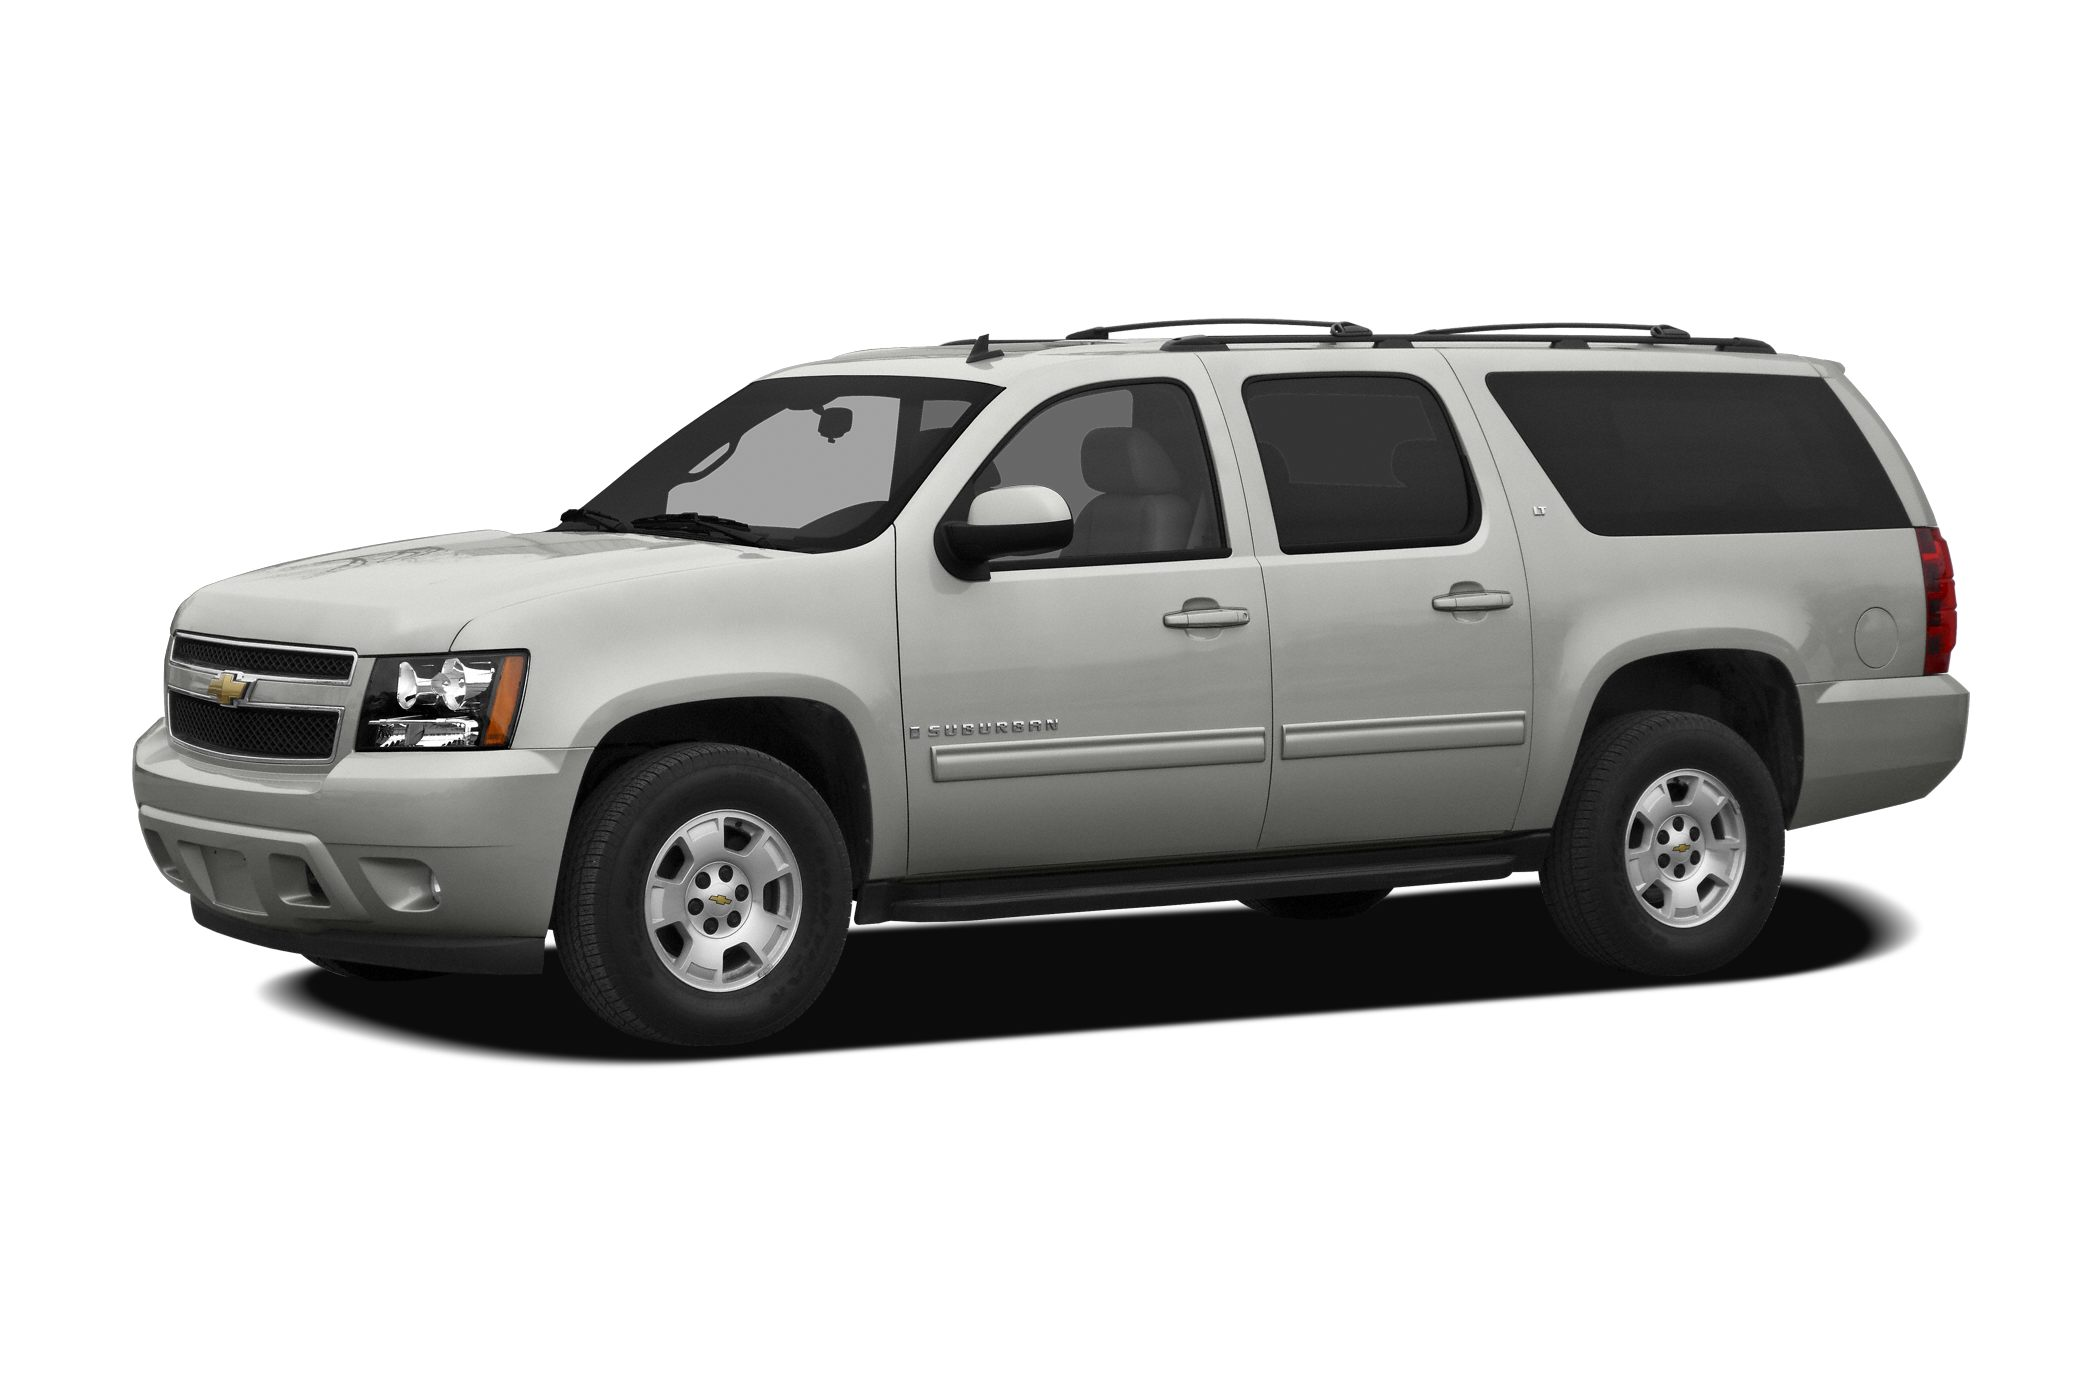 2011 Chevrolet Suburban 1500 Pictures